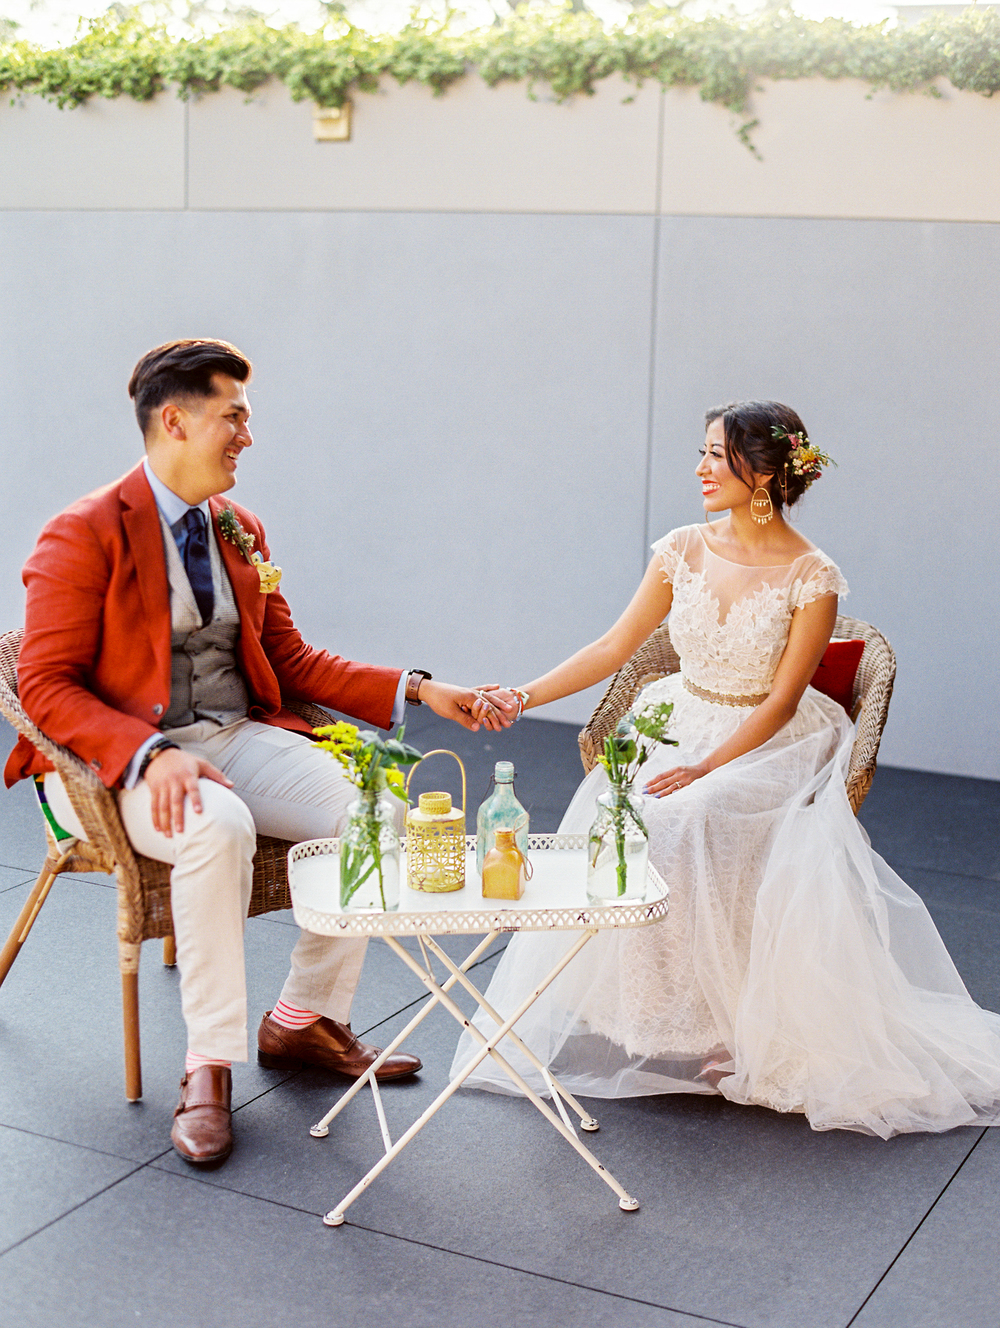 Dana-Fernandez-Photography-Martha-Stewart-Weddings-Houston-Texas-Wedding-Photographer-Film-45.jpg